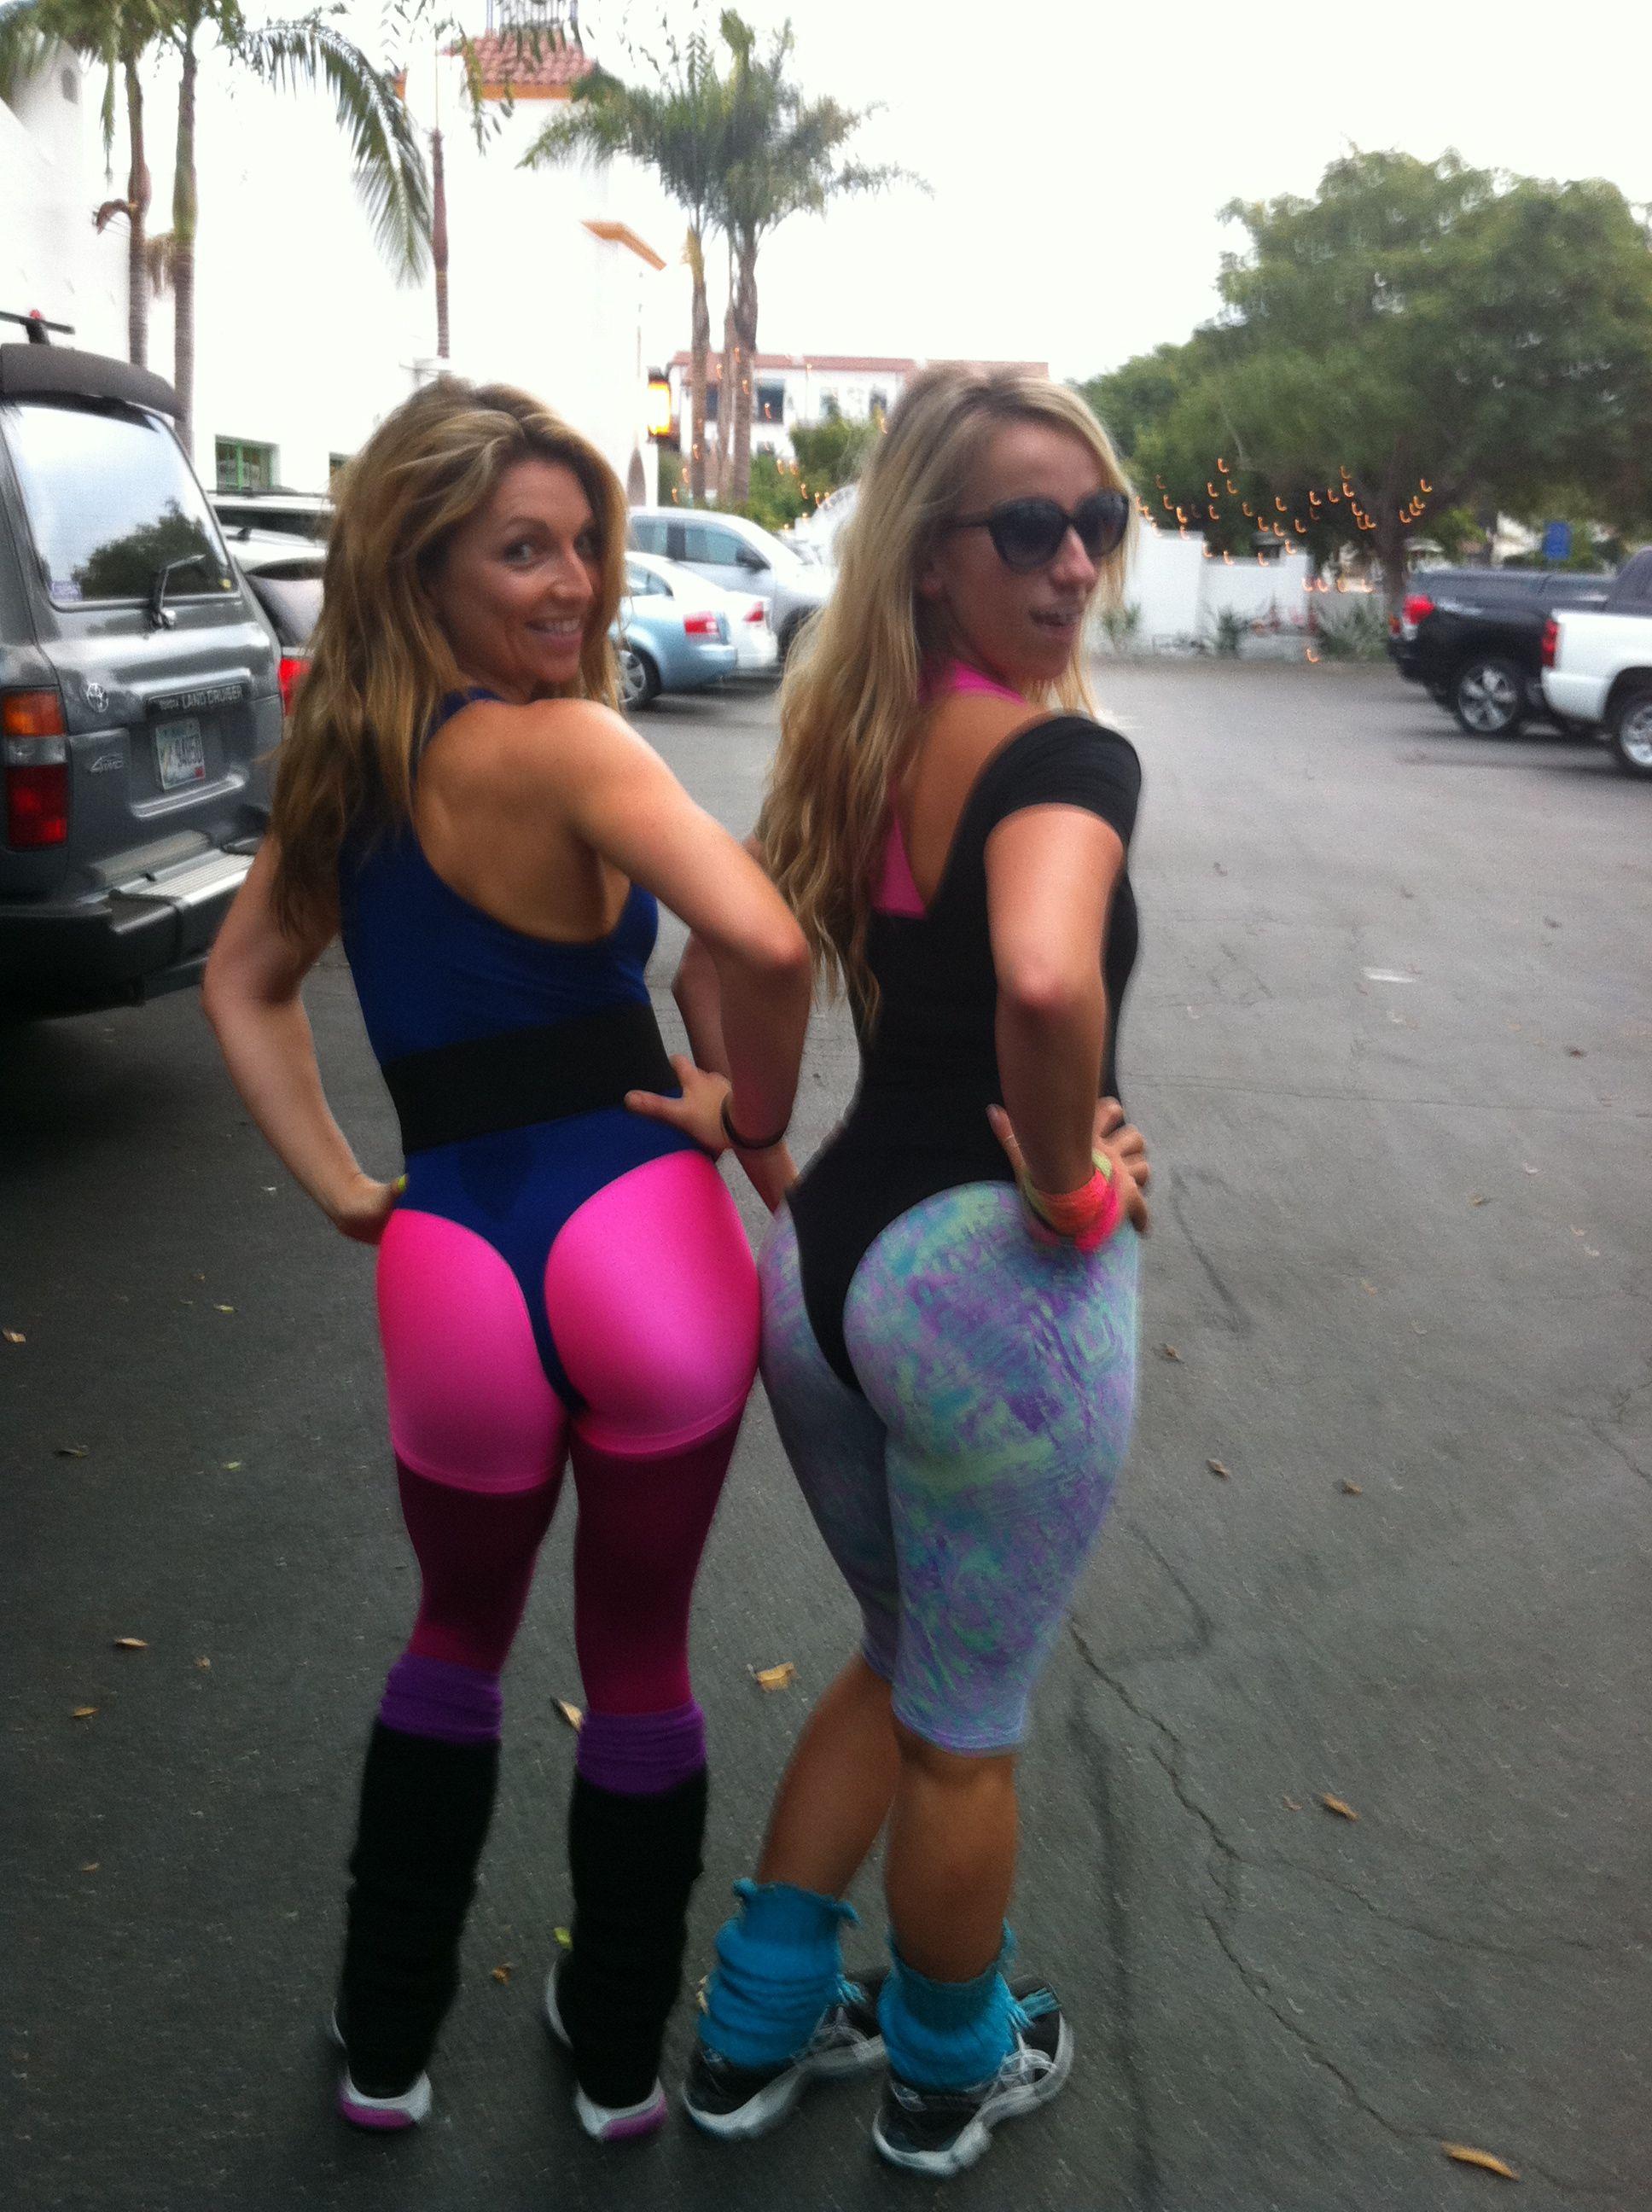 Thongs girls aerobics gallery